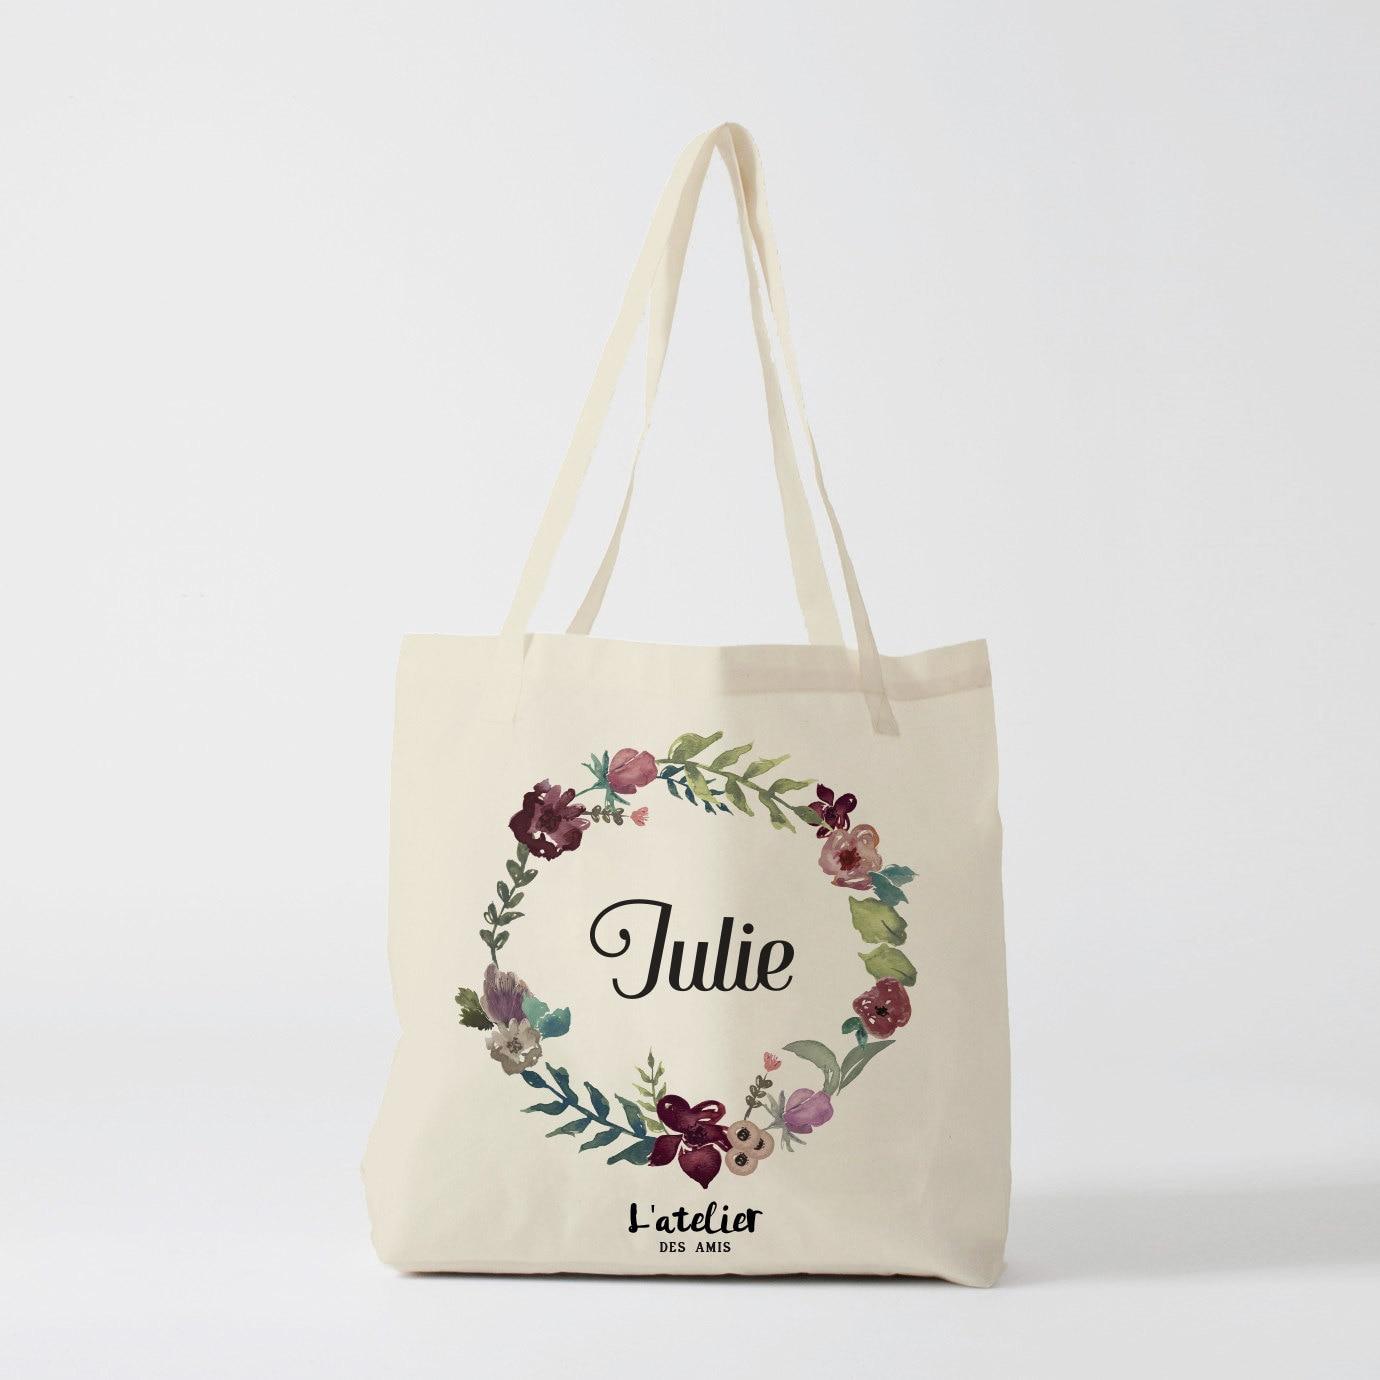 w103y tote bag personnalis wedding sac de toile cabas sac. Black Bedroom Furniture Sets. Home Design Ideas